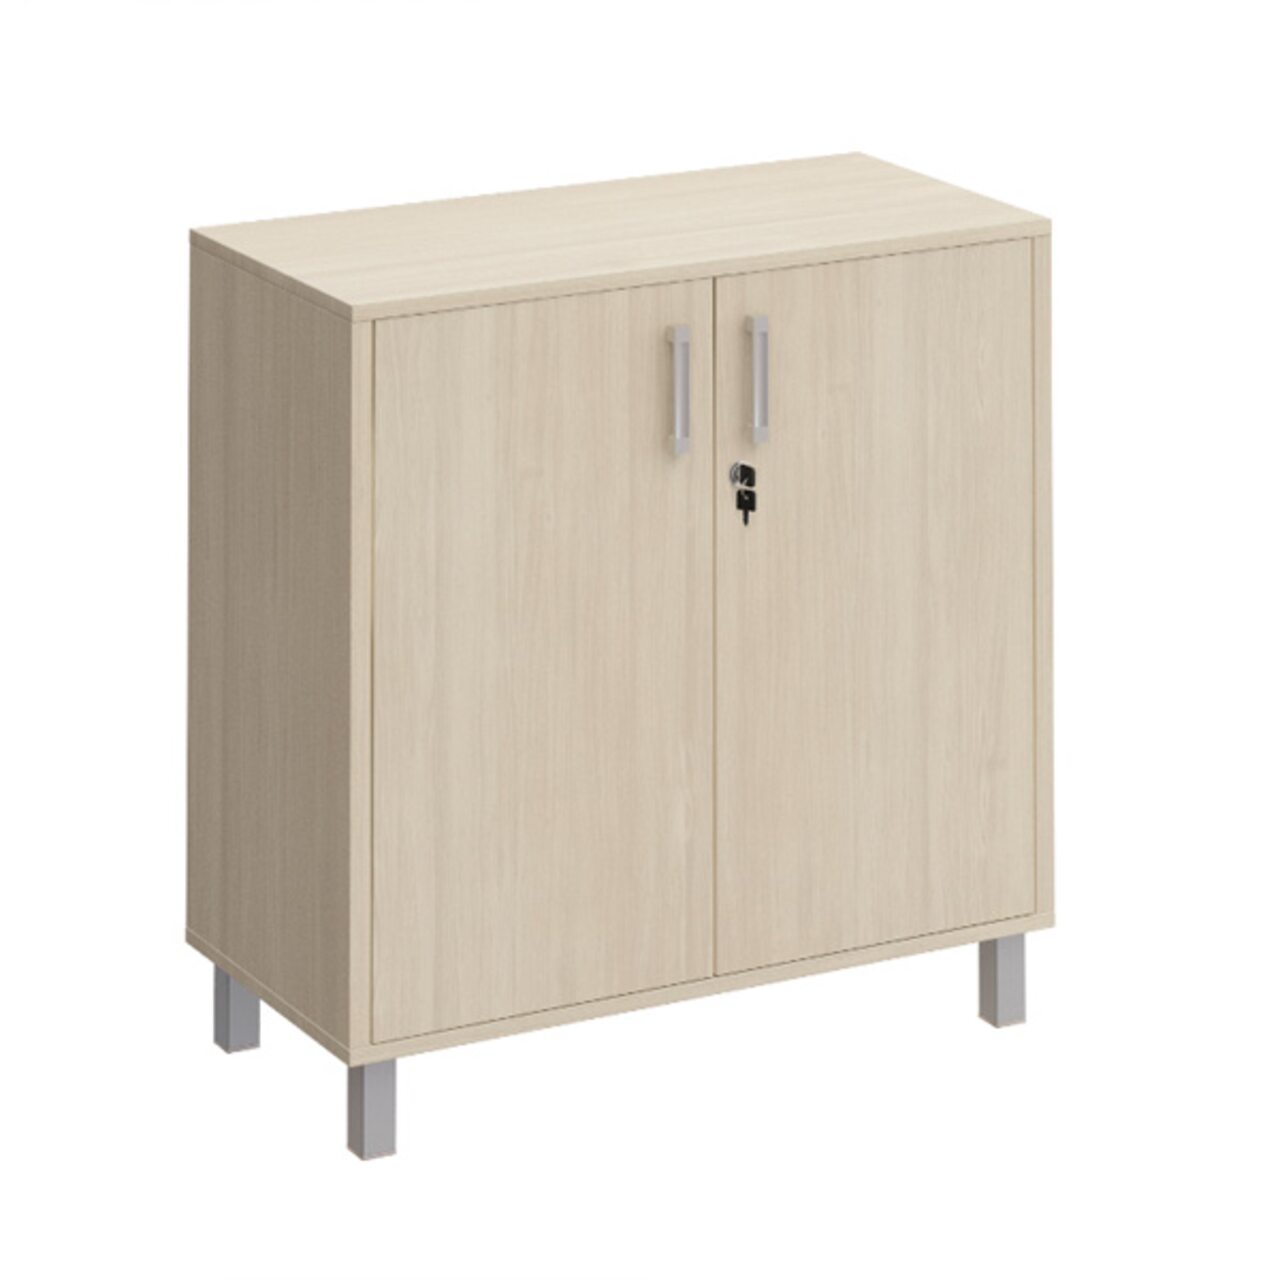 Шкаф для документов две глухие двери с замком  БОРН LT 90x45x94 - фото 1